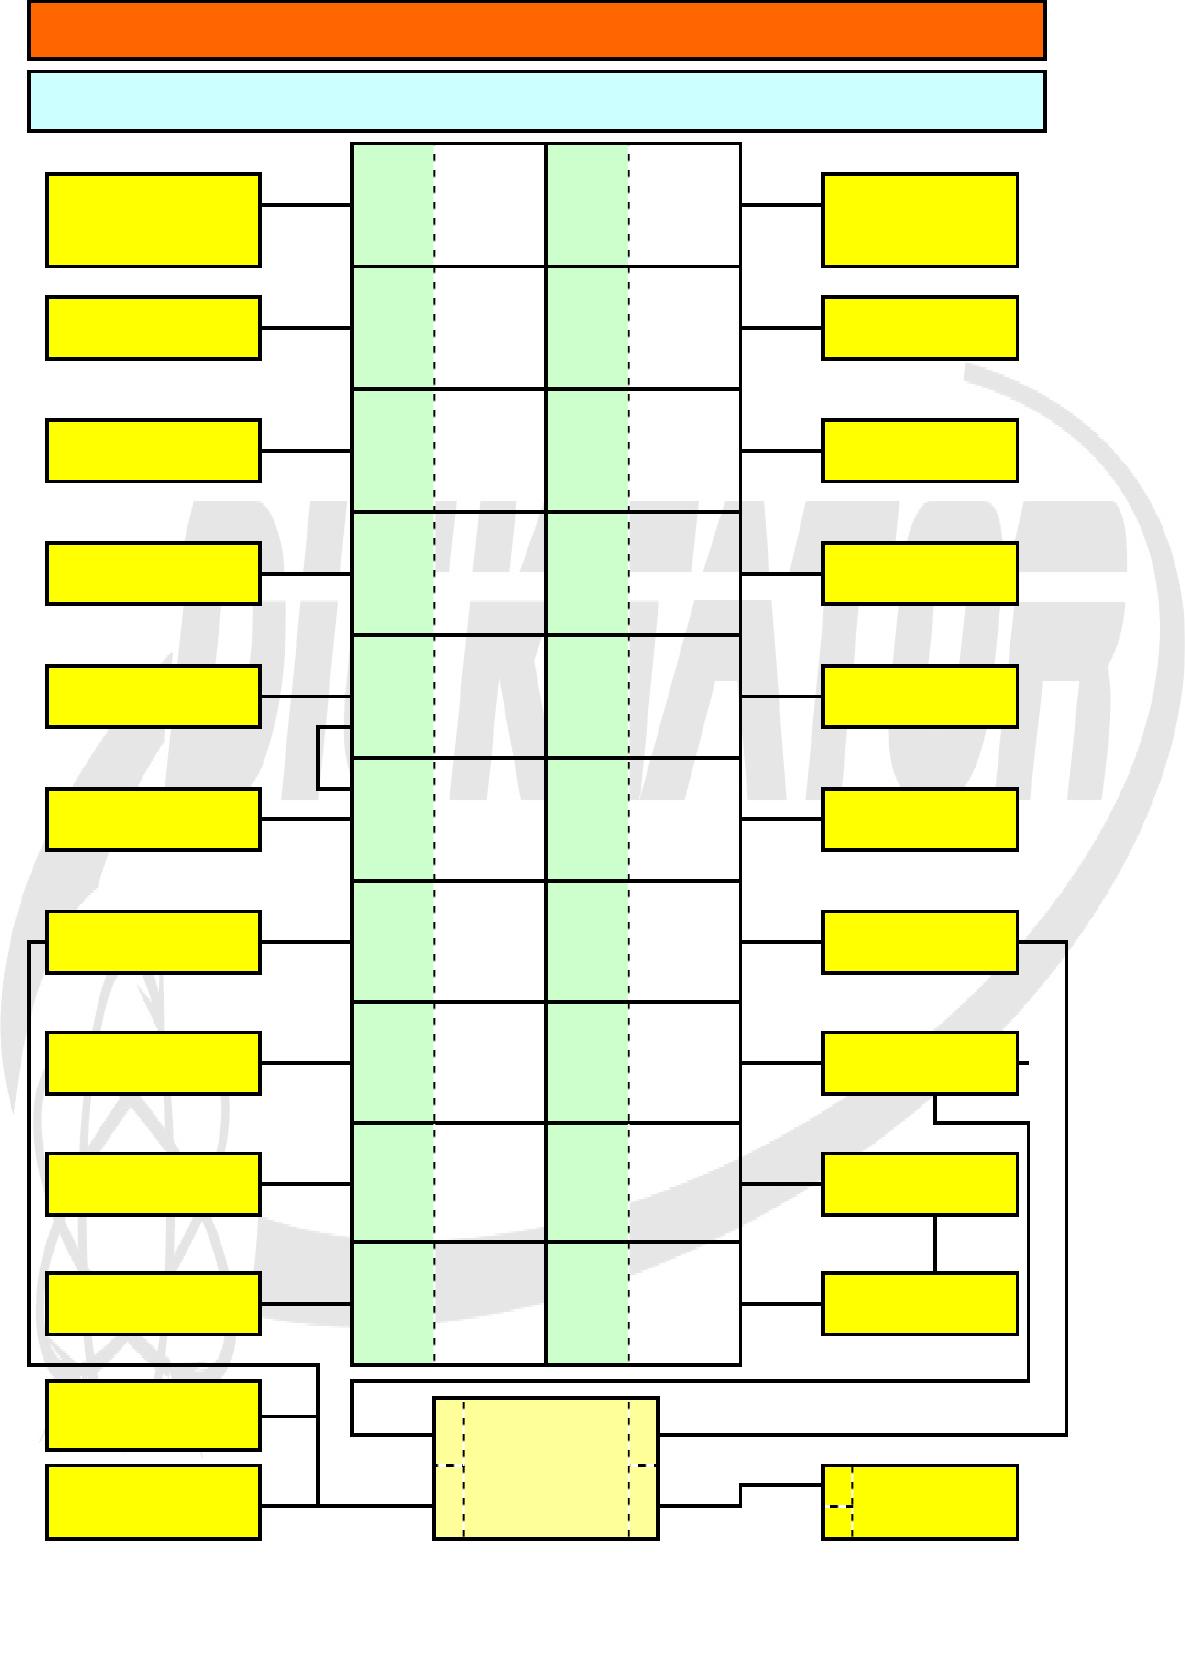 Dicktator Connection Diagrams September 2009 Pdf Document